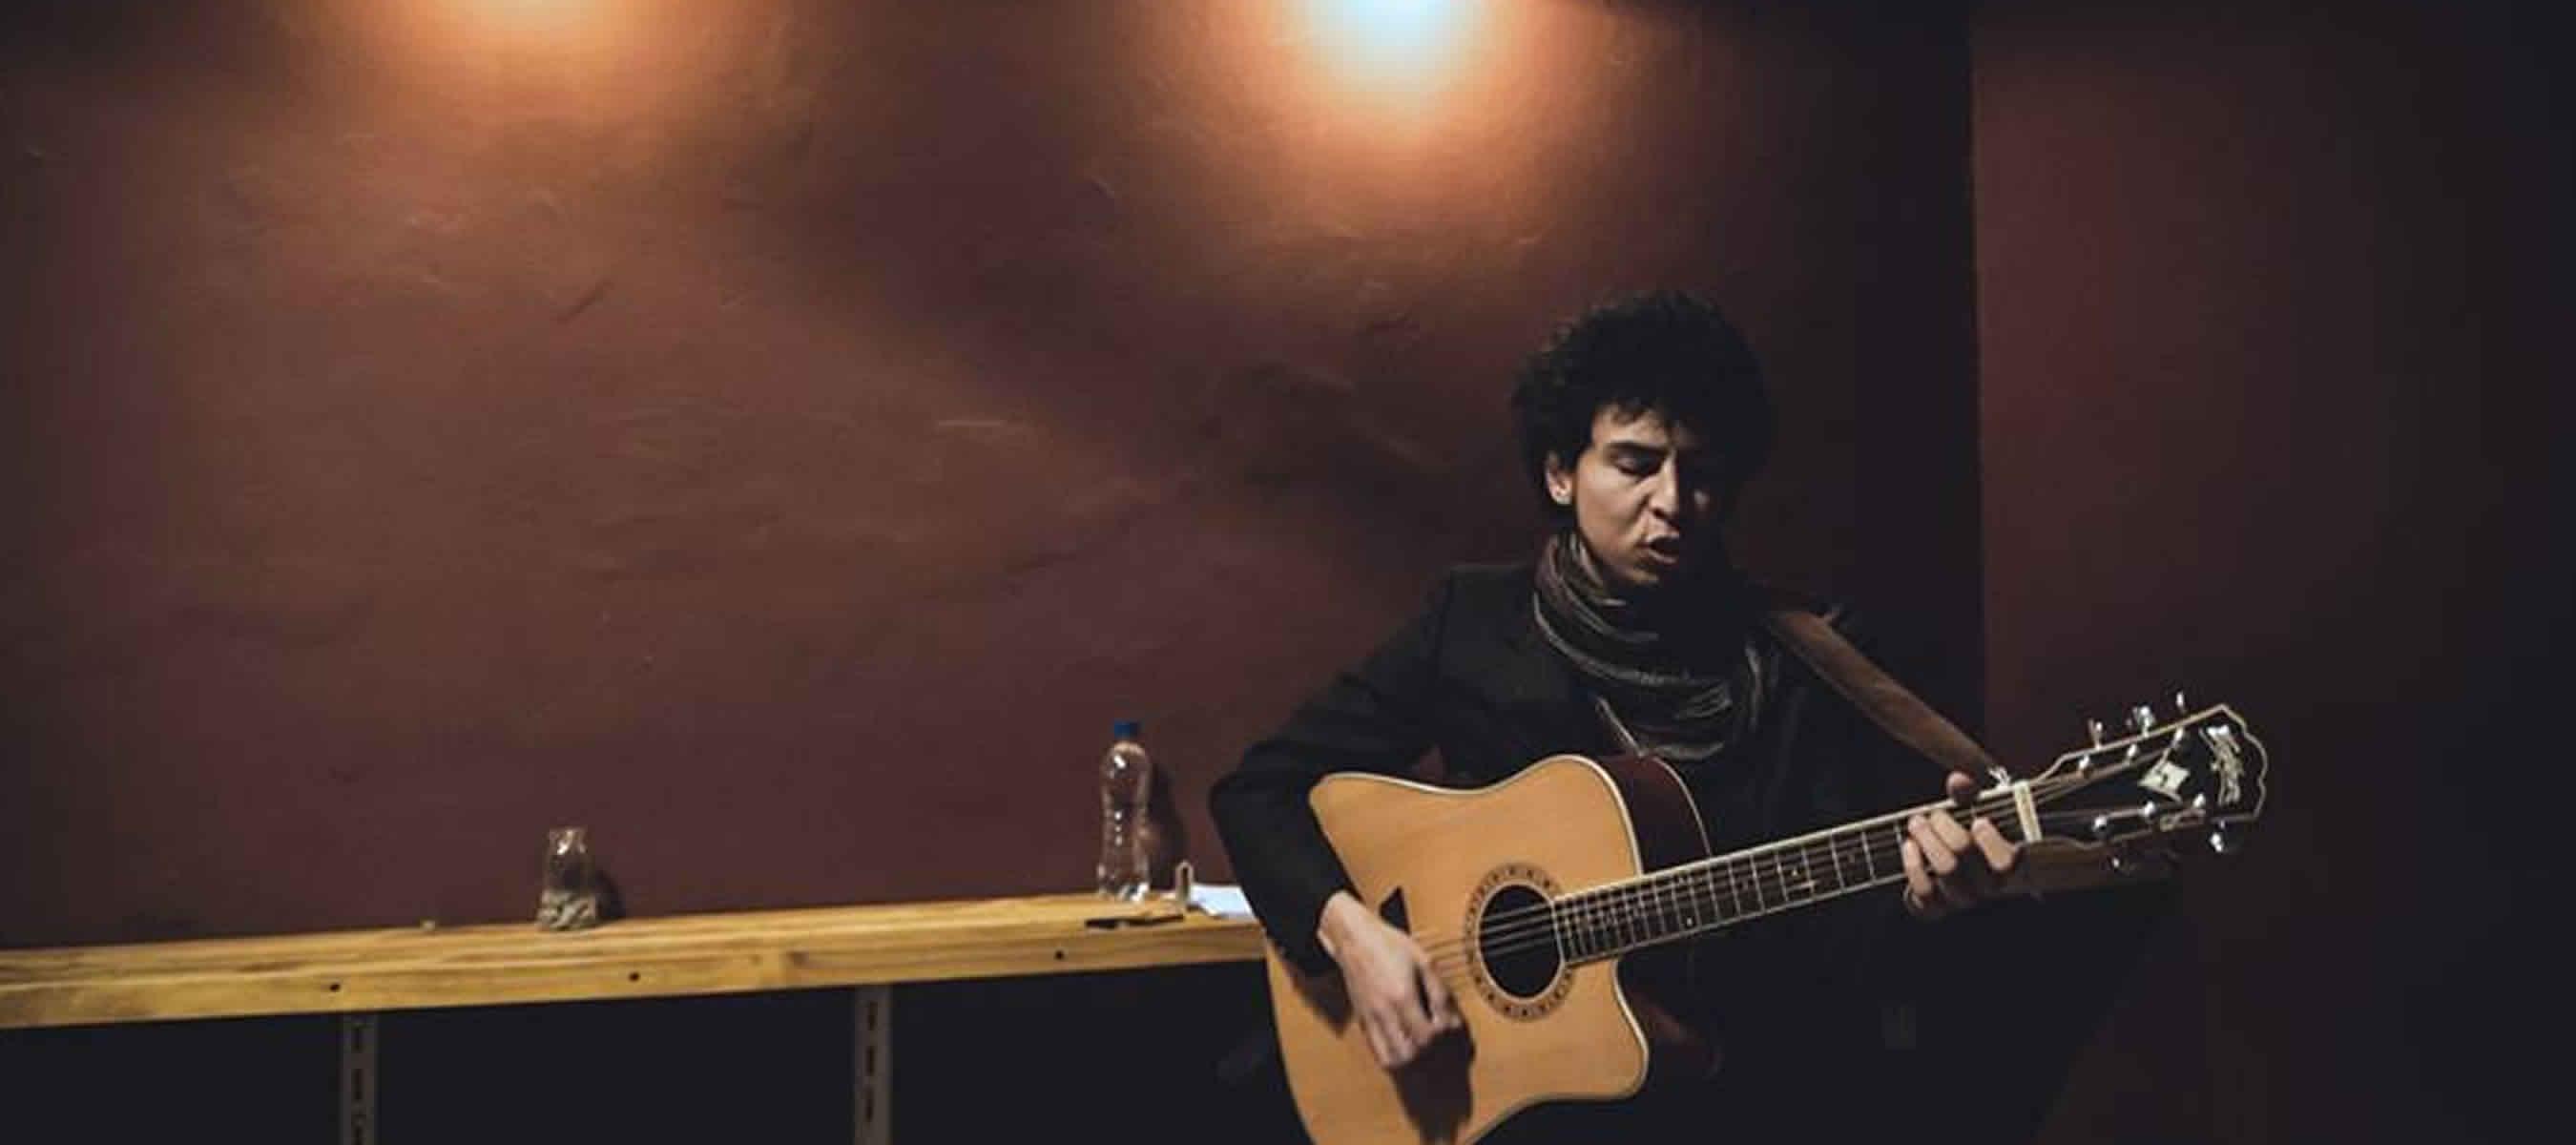 Leo Parra Castillo - blues smoking molly